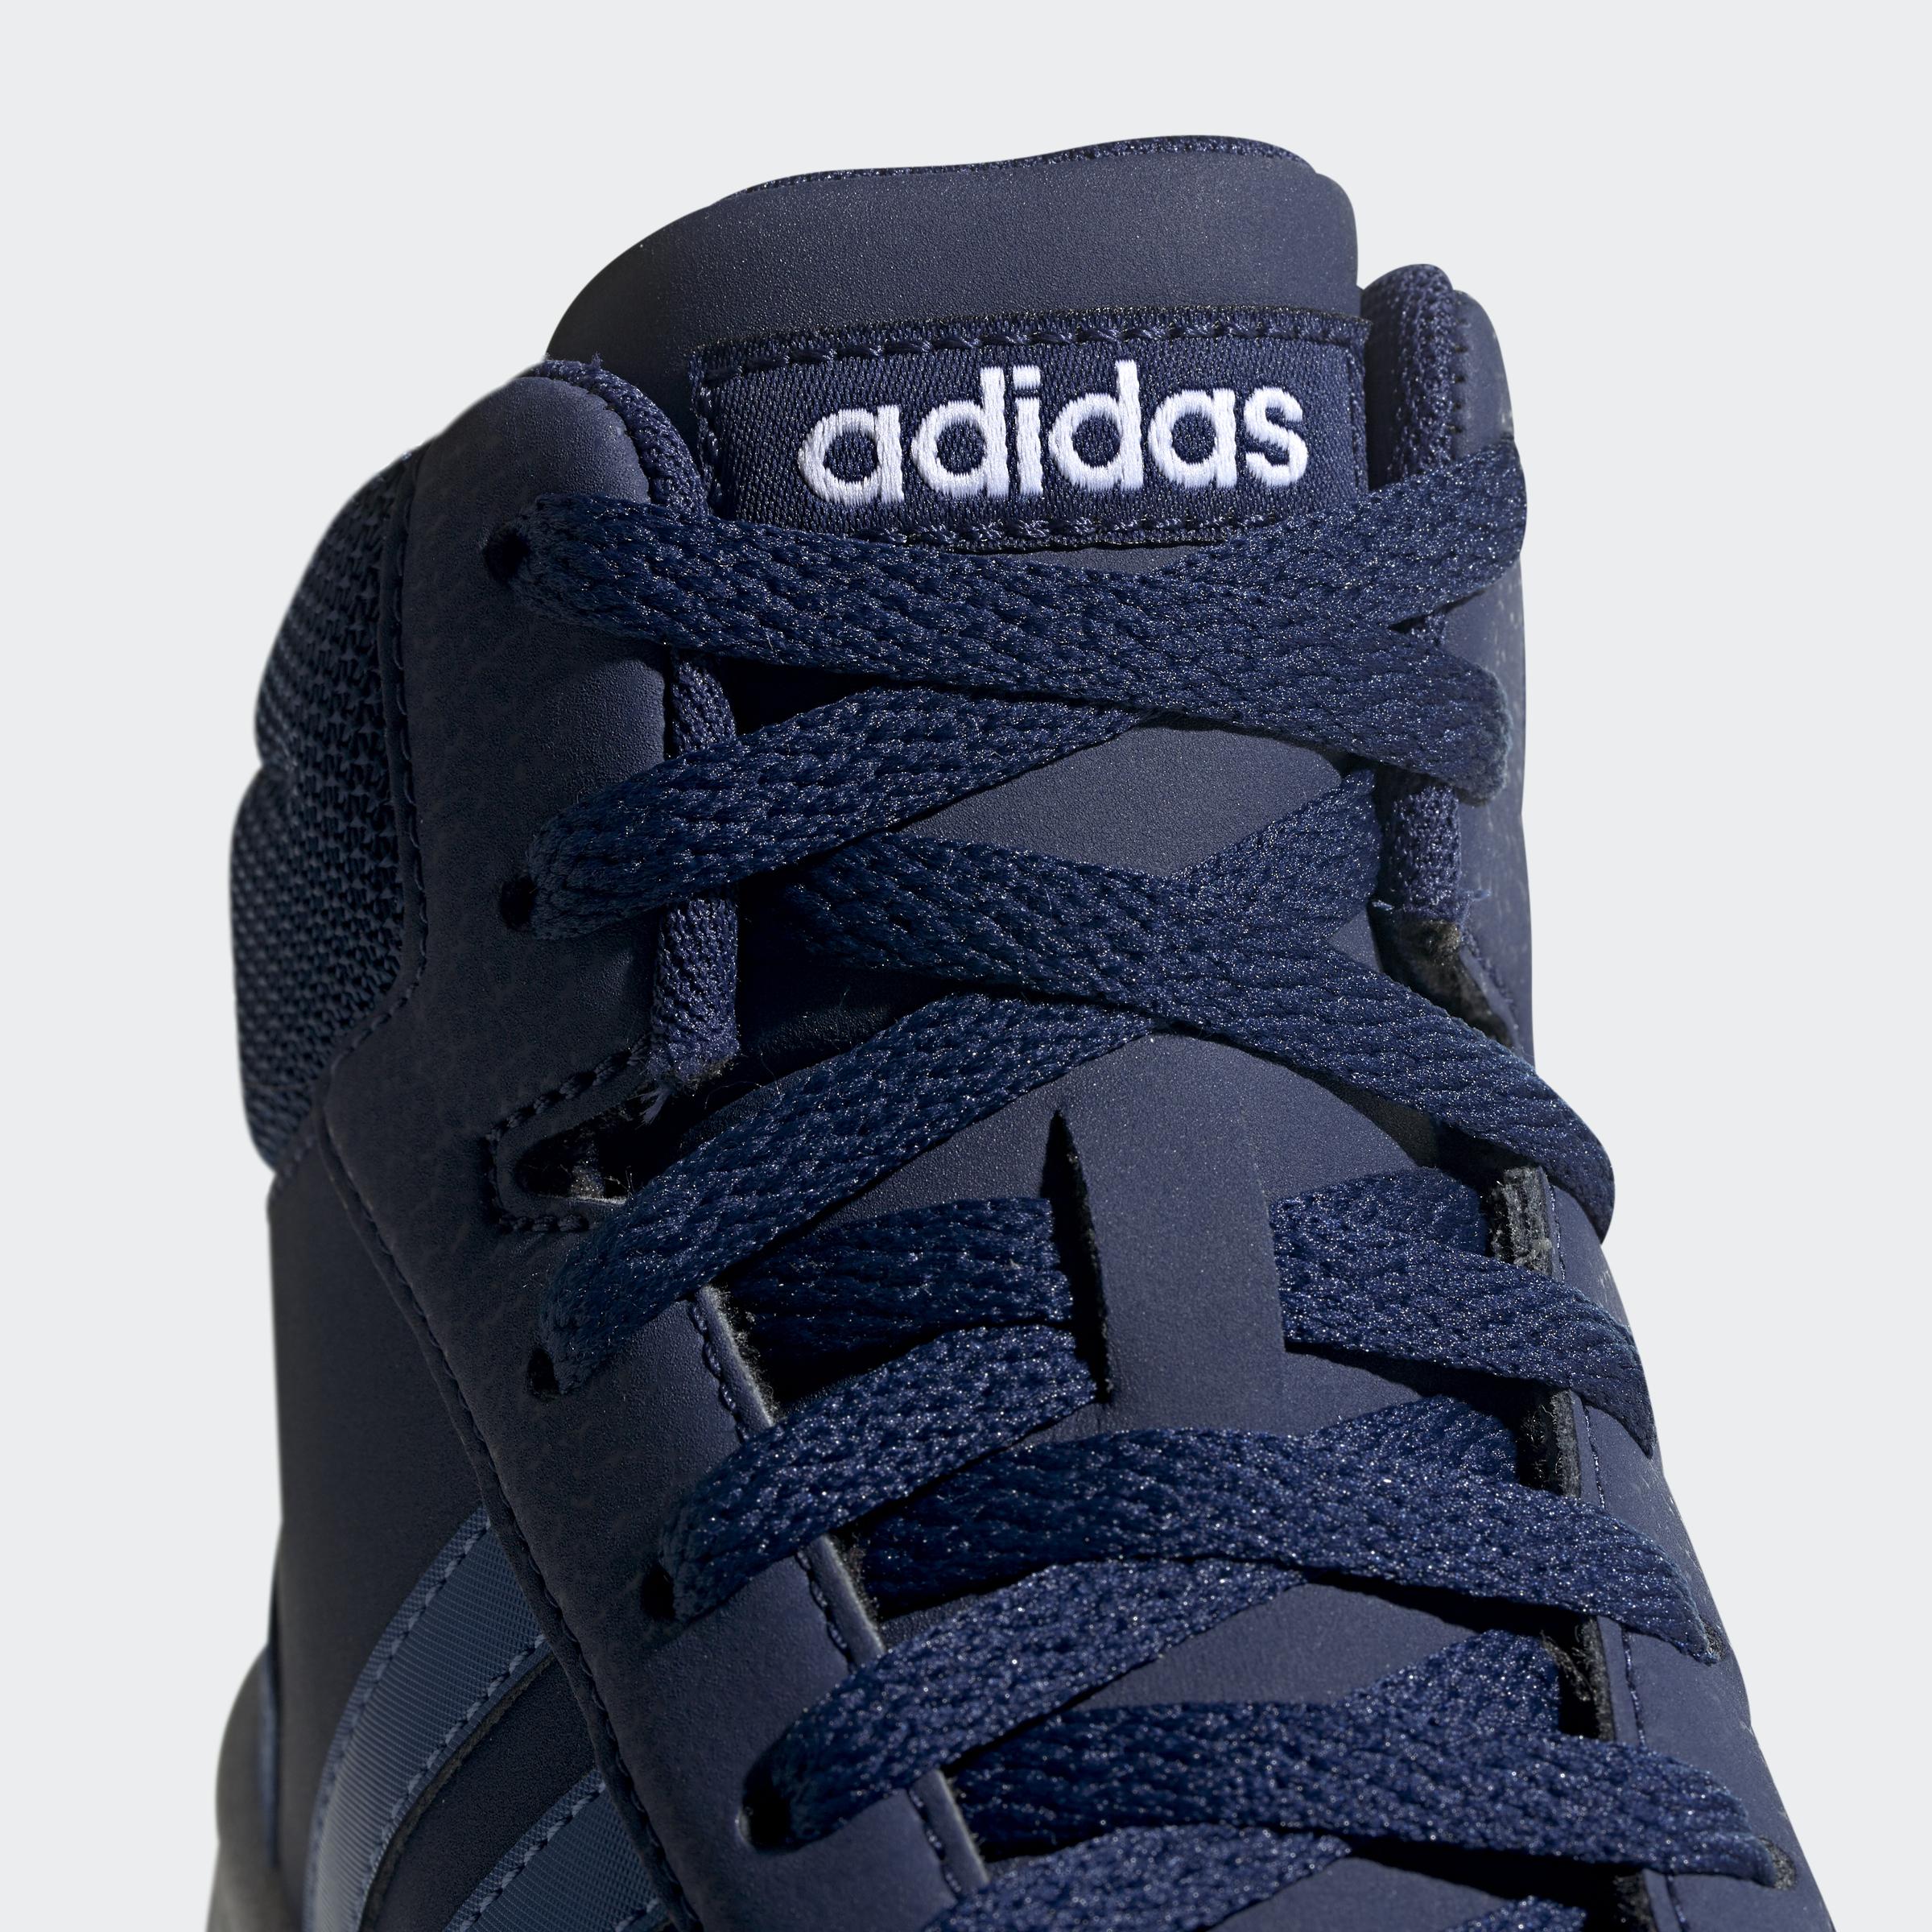 adidas-Hoops-2-0-Mid-Shoes-Kids-039-High-Tops thumbnail 10